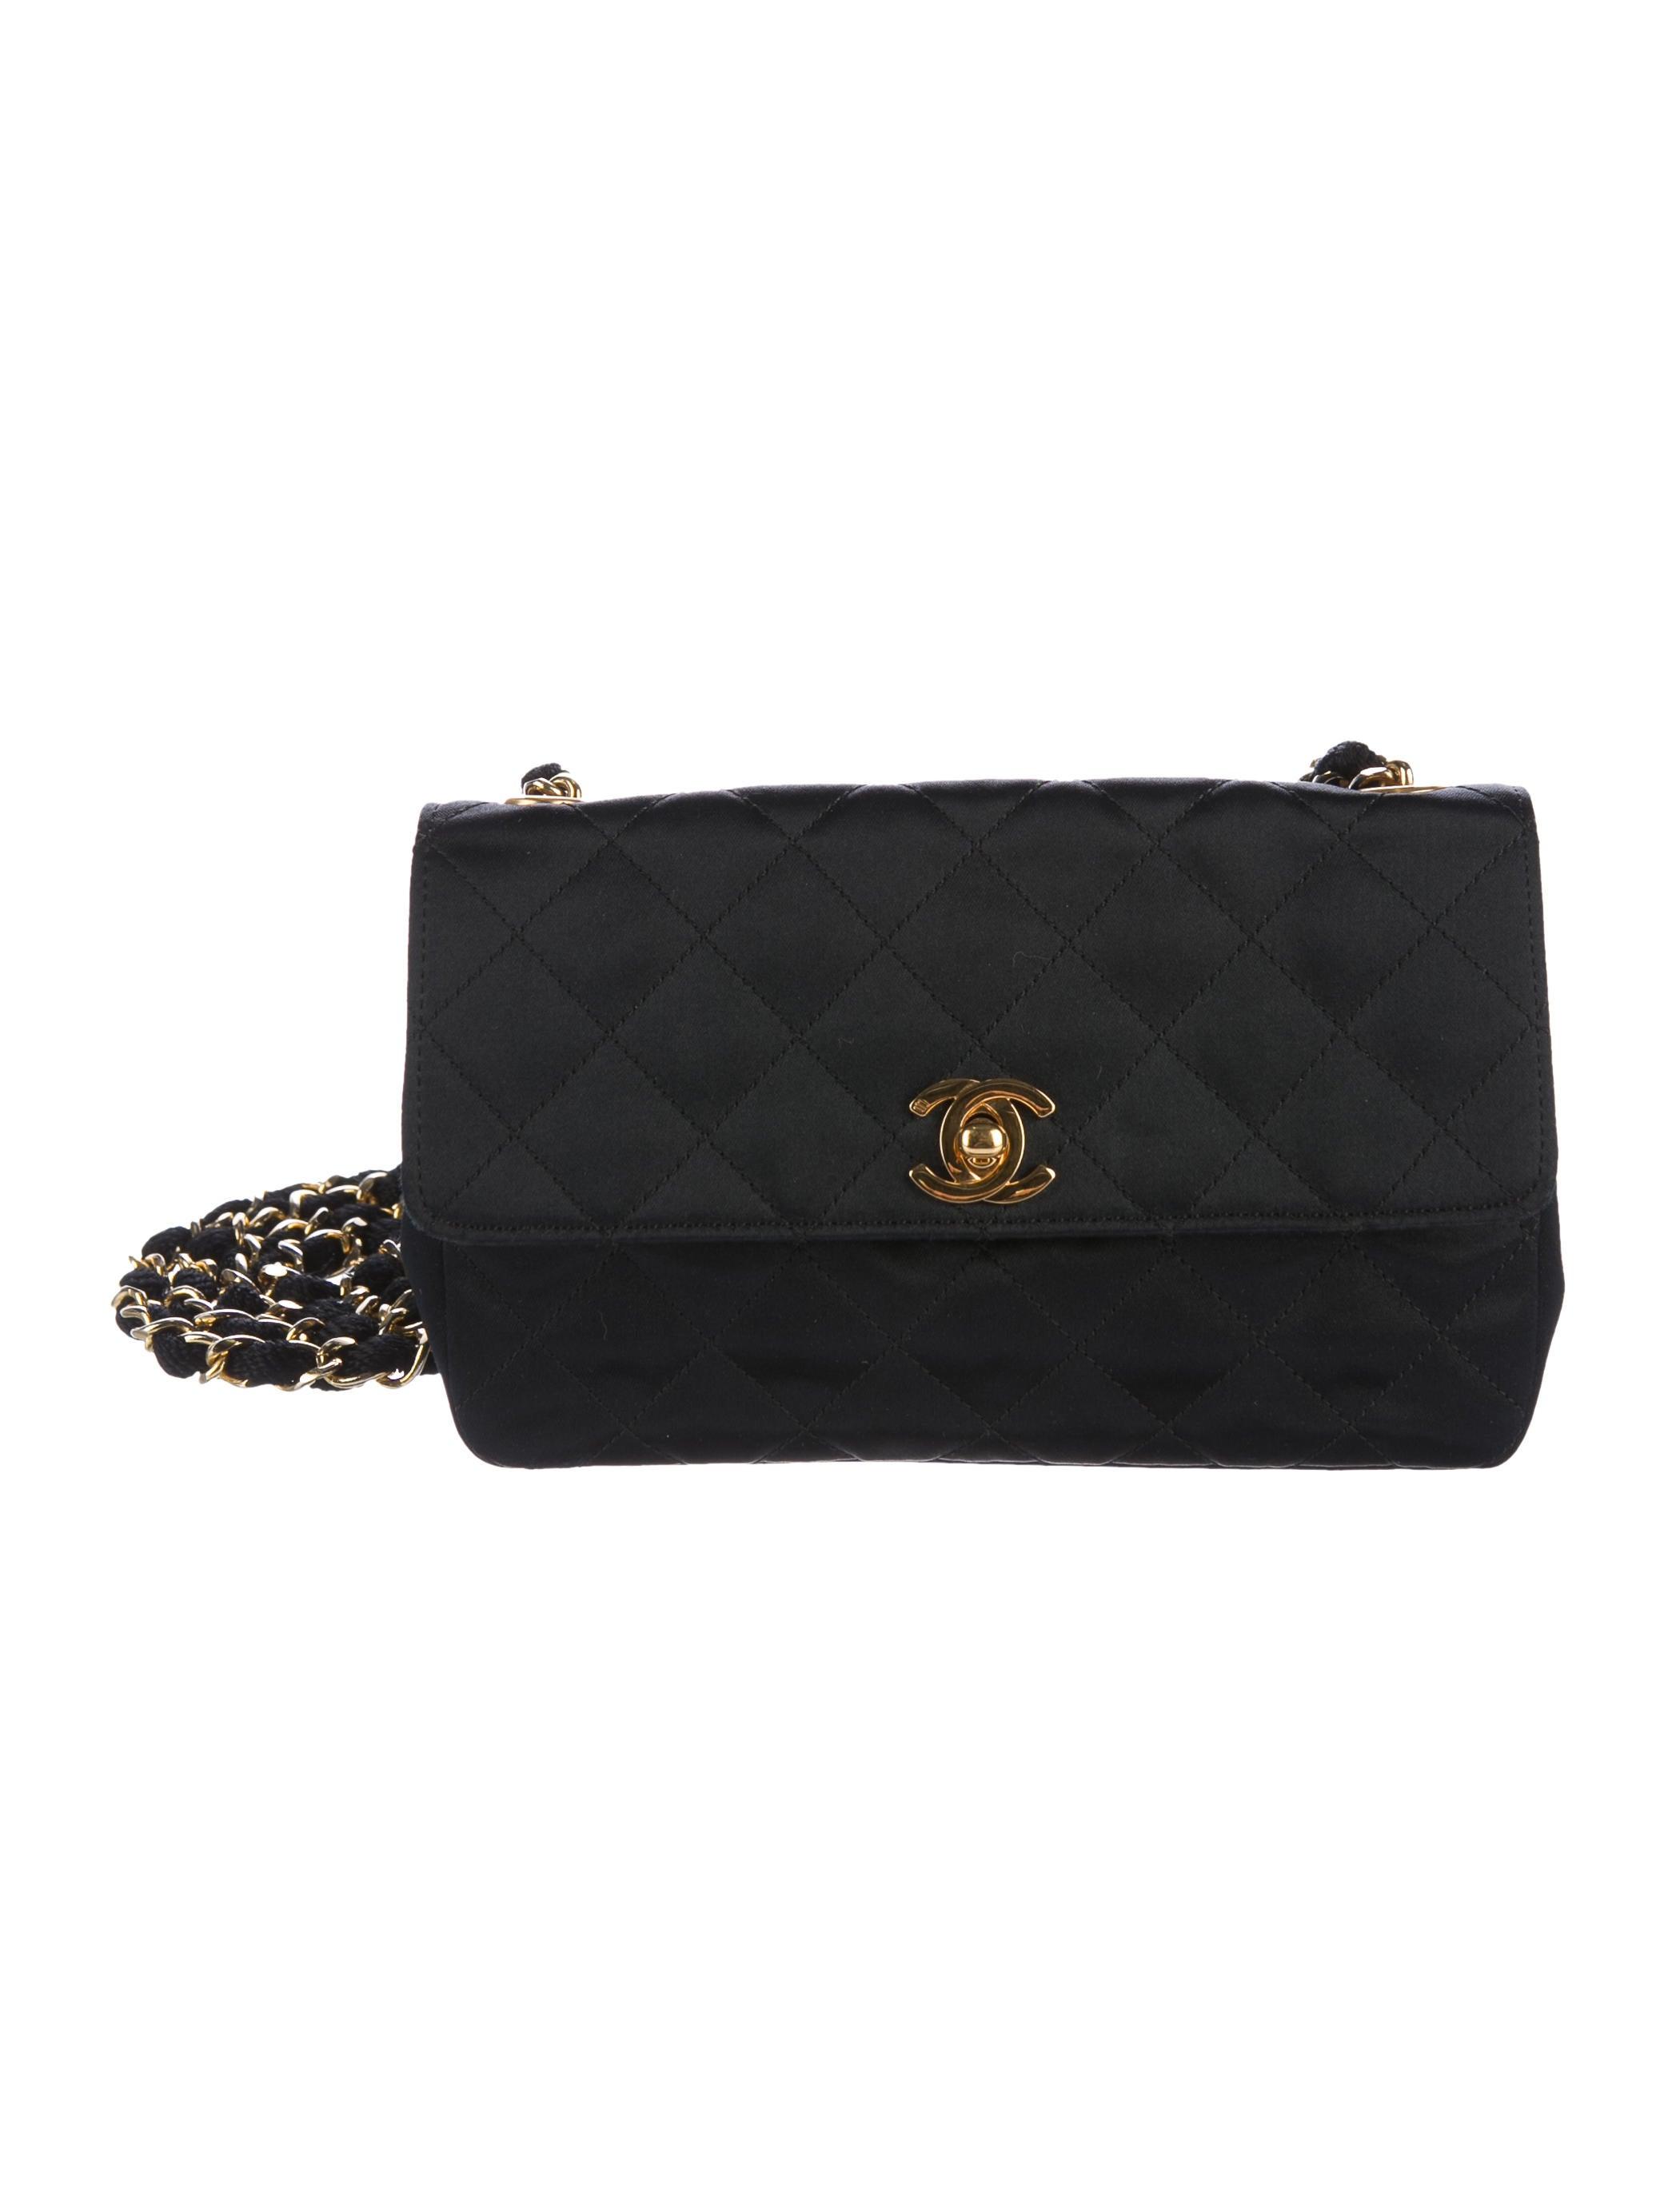 9de39df15885 Chanel Vintage Satin Mini Bag - Handbags - CHA215674 | The RealReal